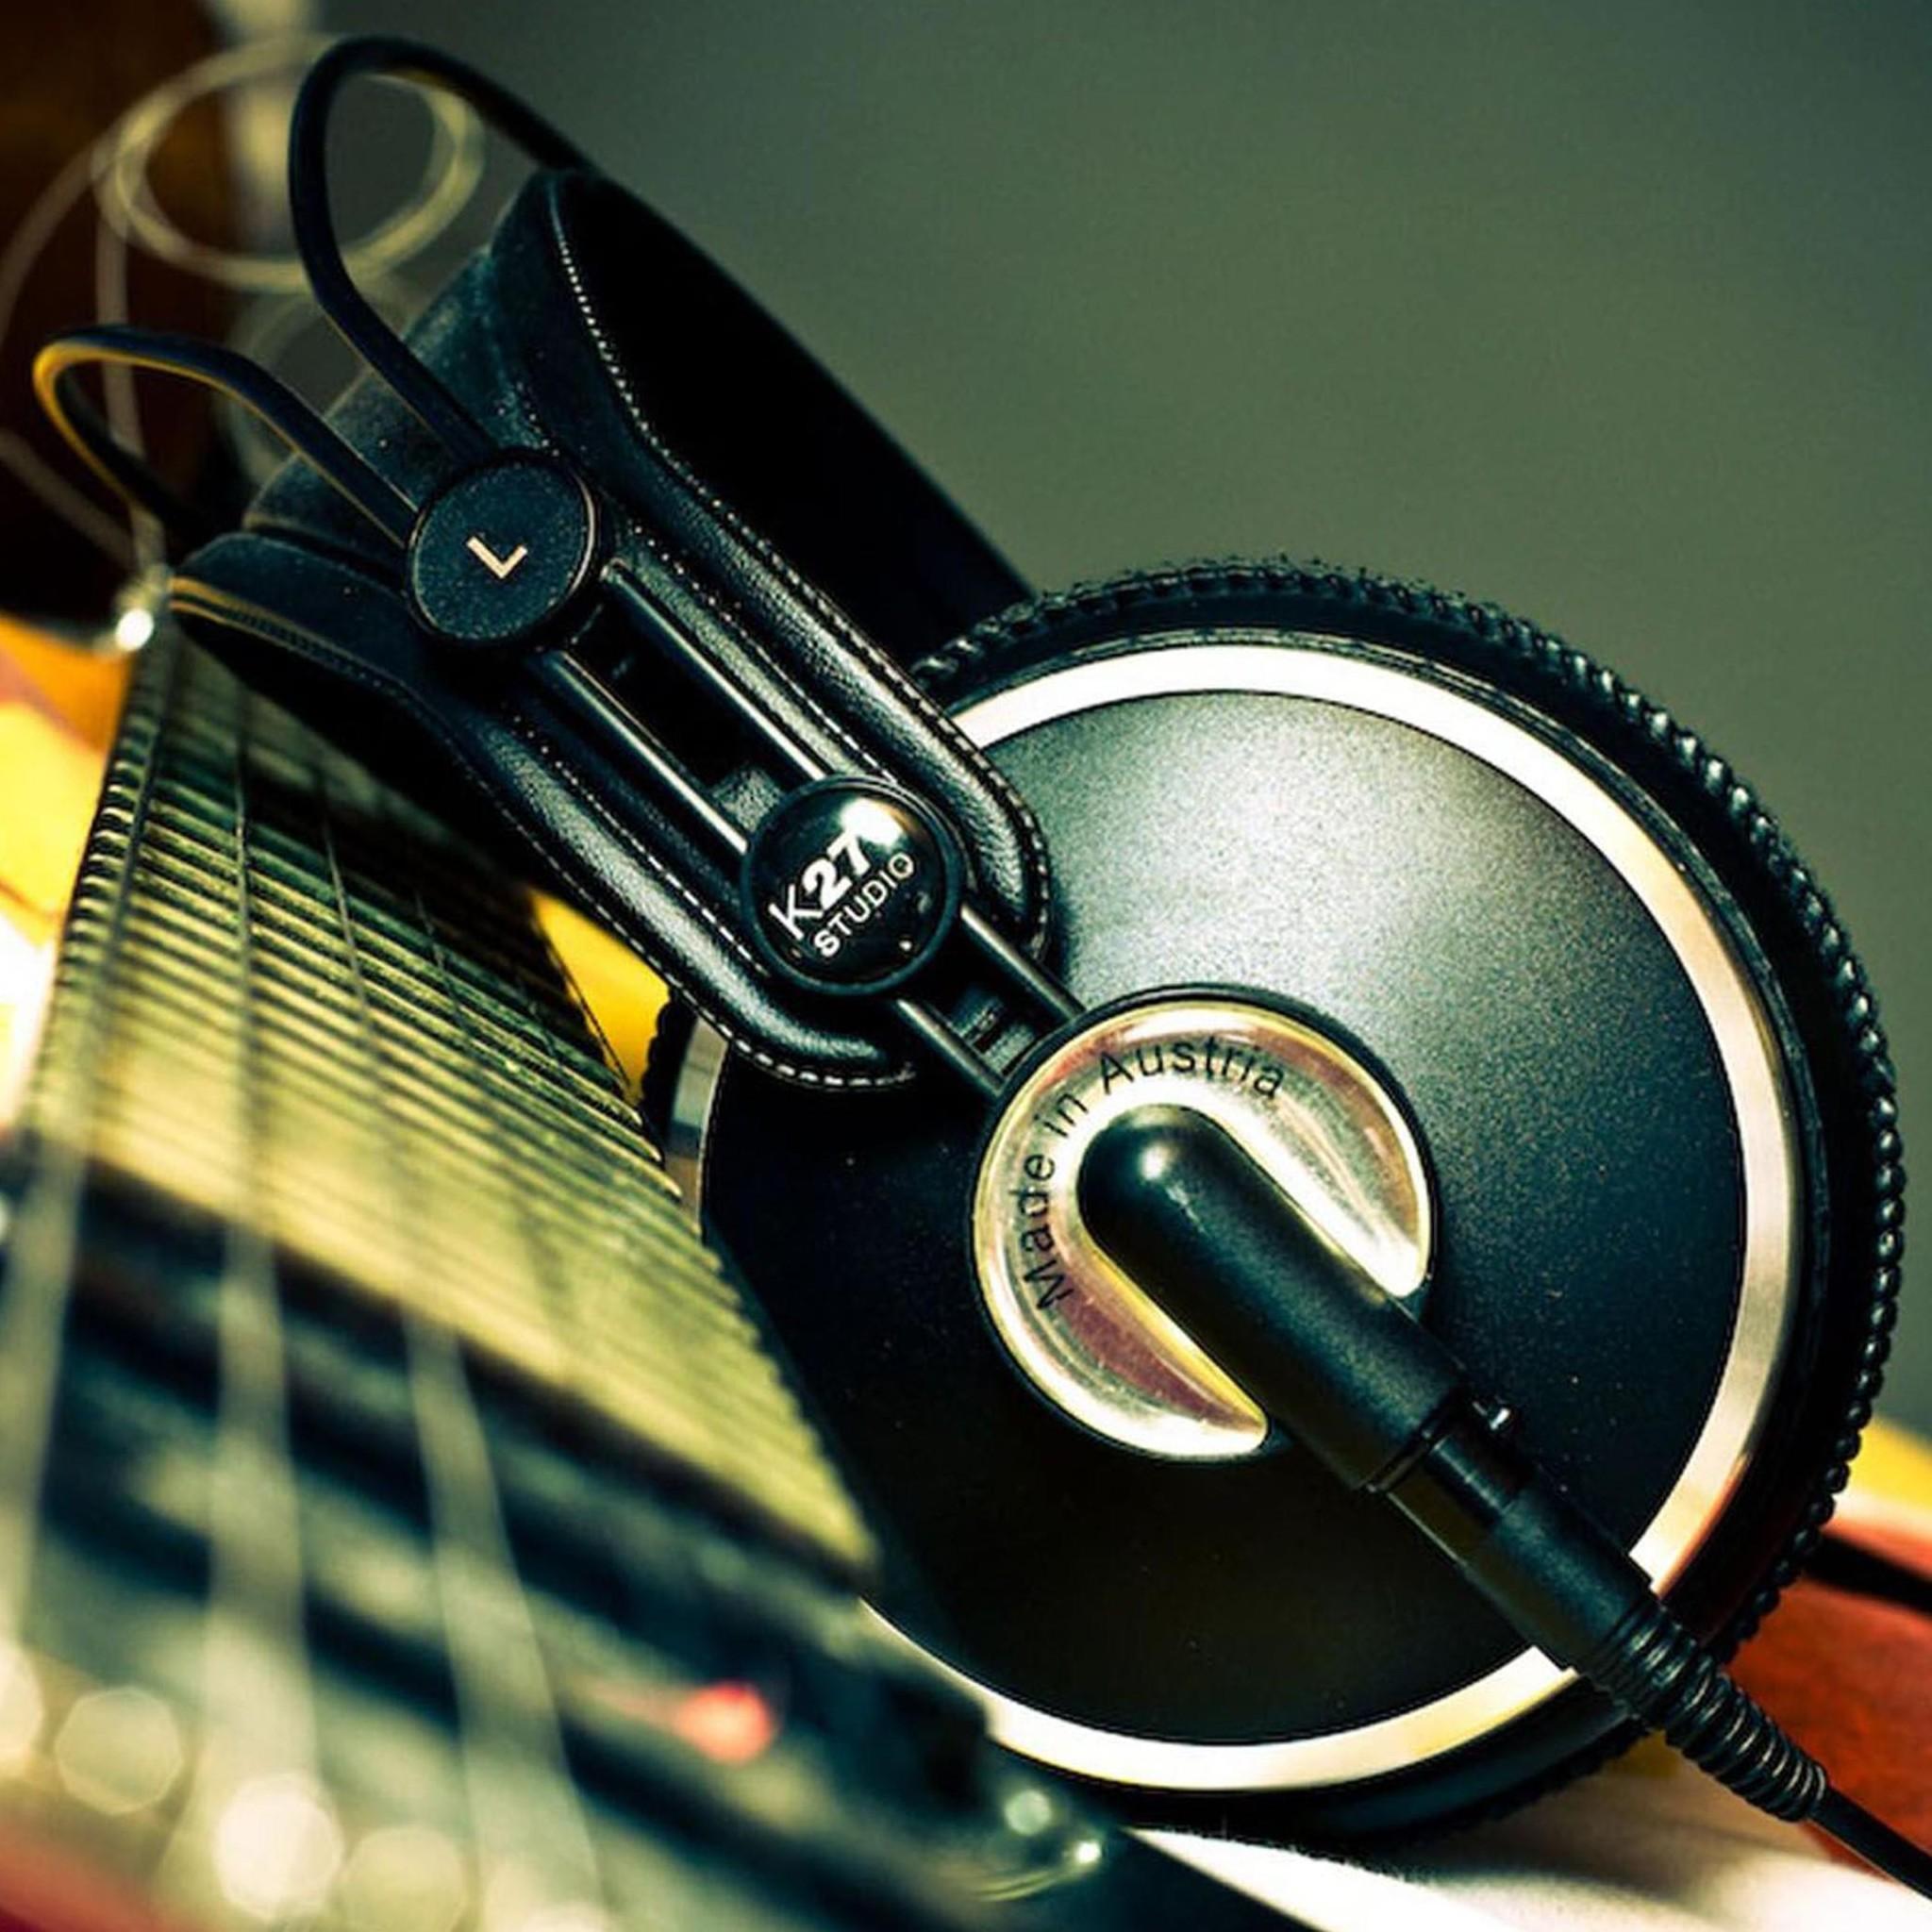 Music Wallpaper For IPad